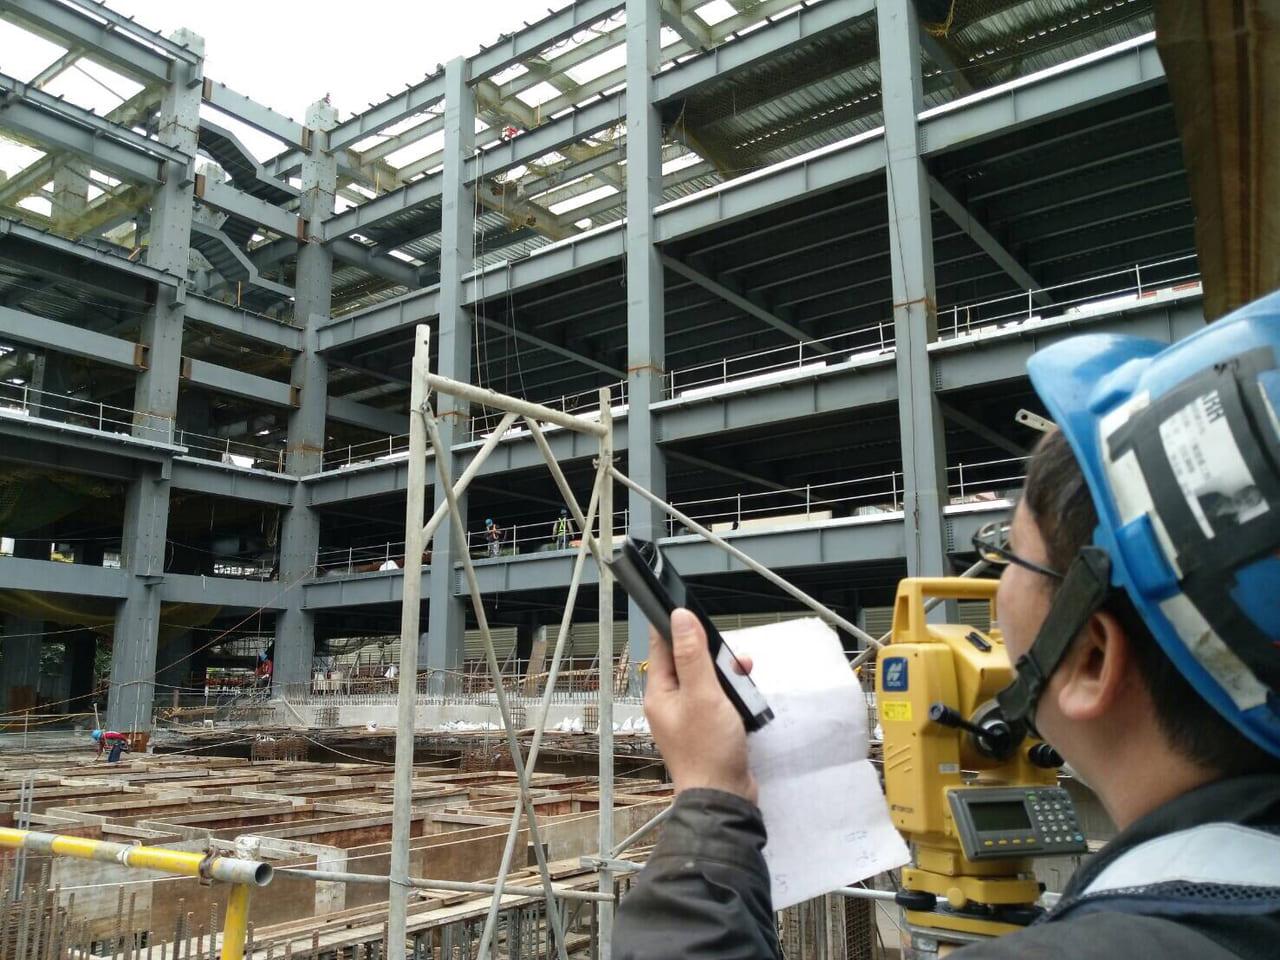 AWEC's building site